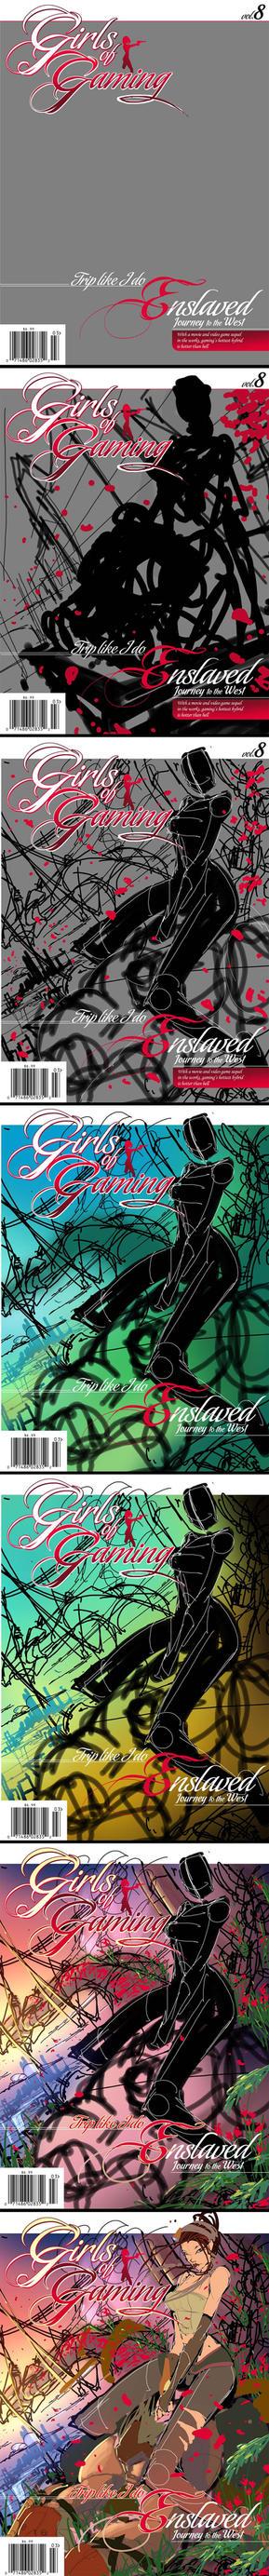 Enslaved Cover  WIP 01 by RobDuenas